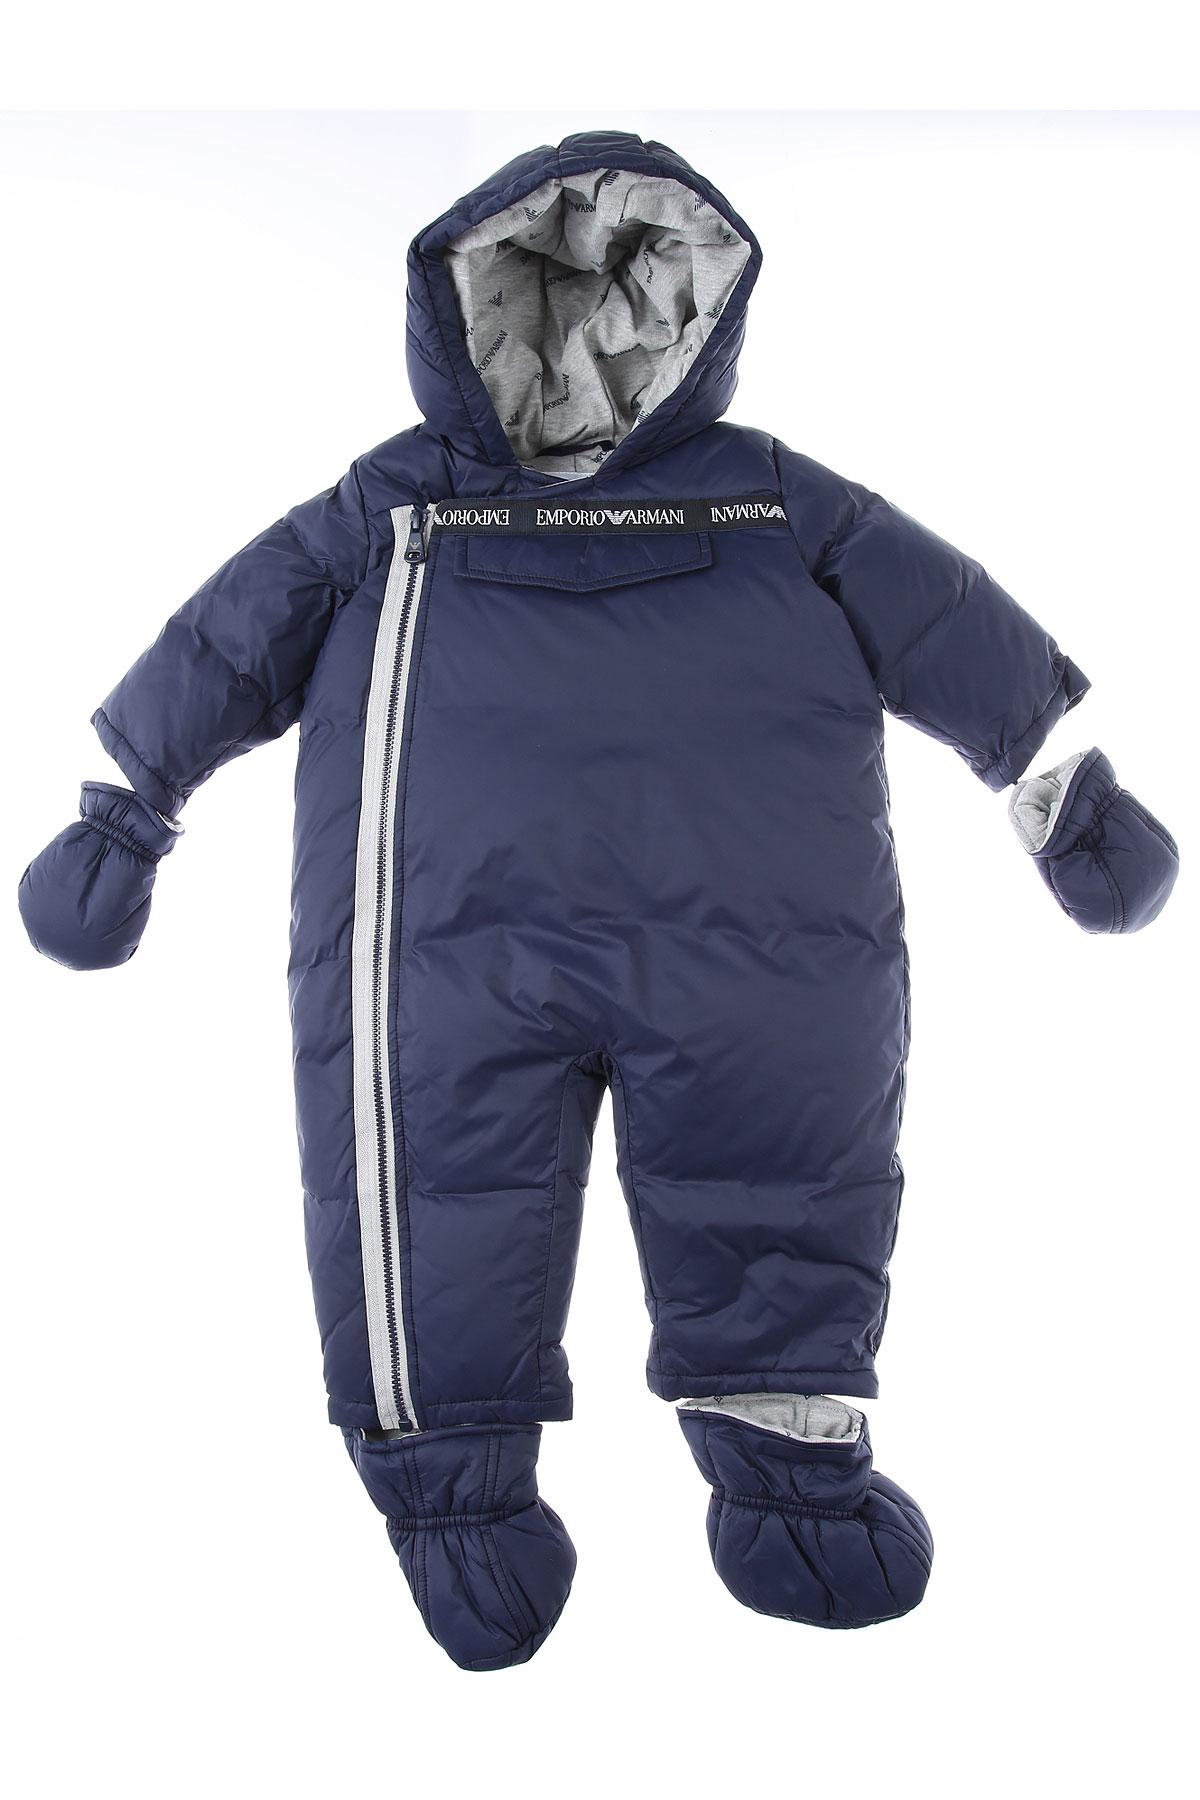 Emporio Armani Baby Down Jacket for Boys On Sale, Blue, polyamide, 2019, 3M 6M